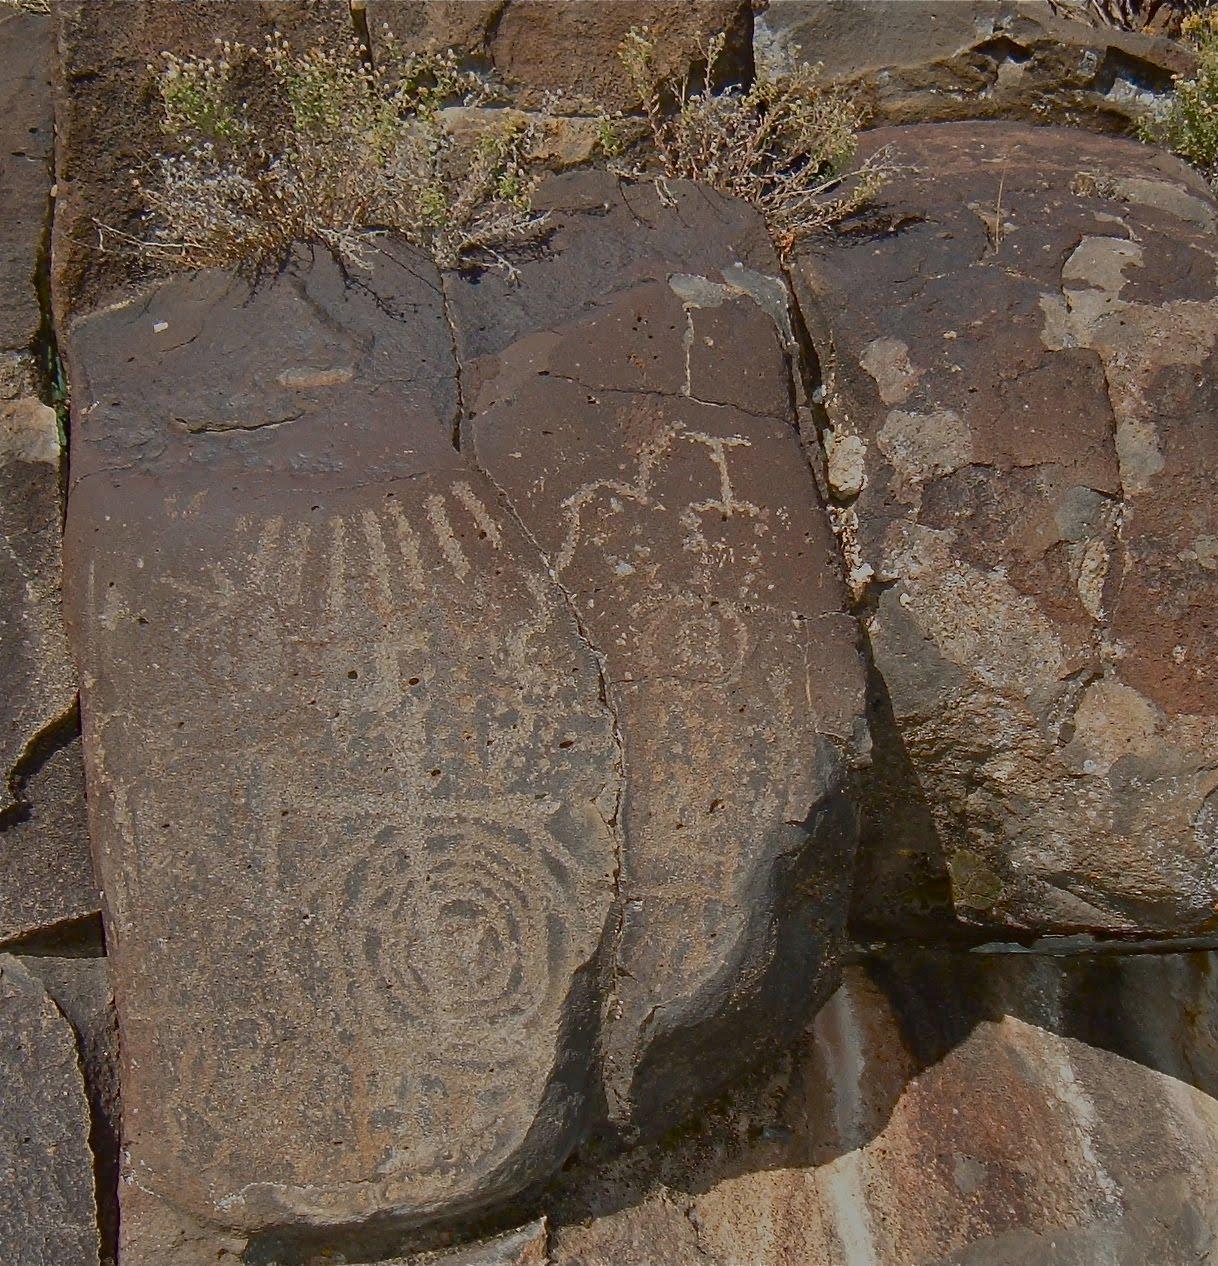 Taos Rock Art Spiral Petroglyphs 2